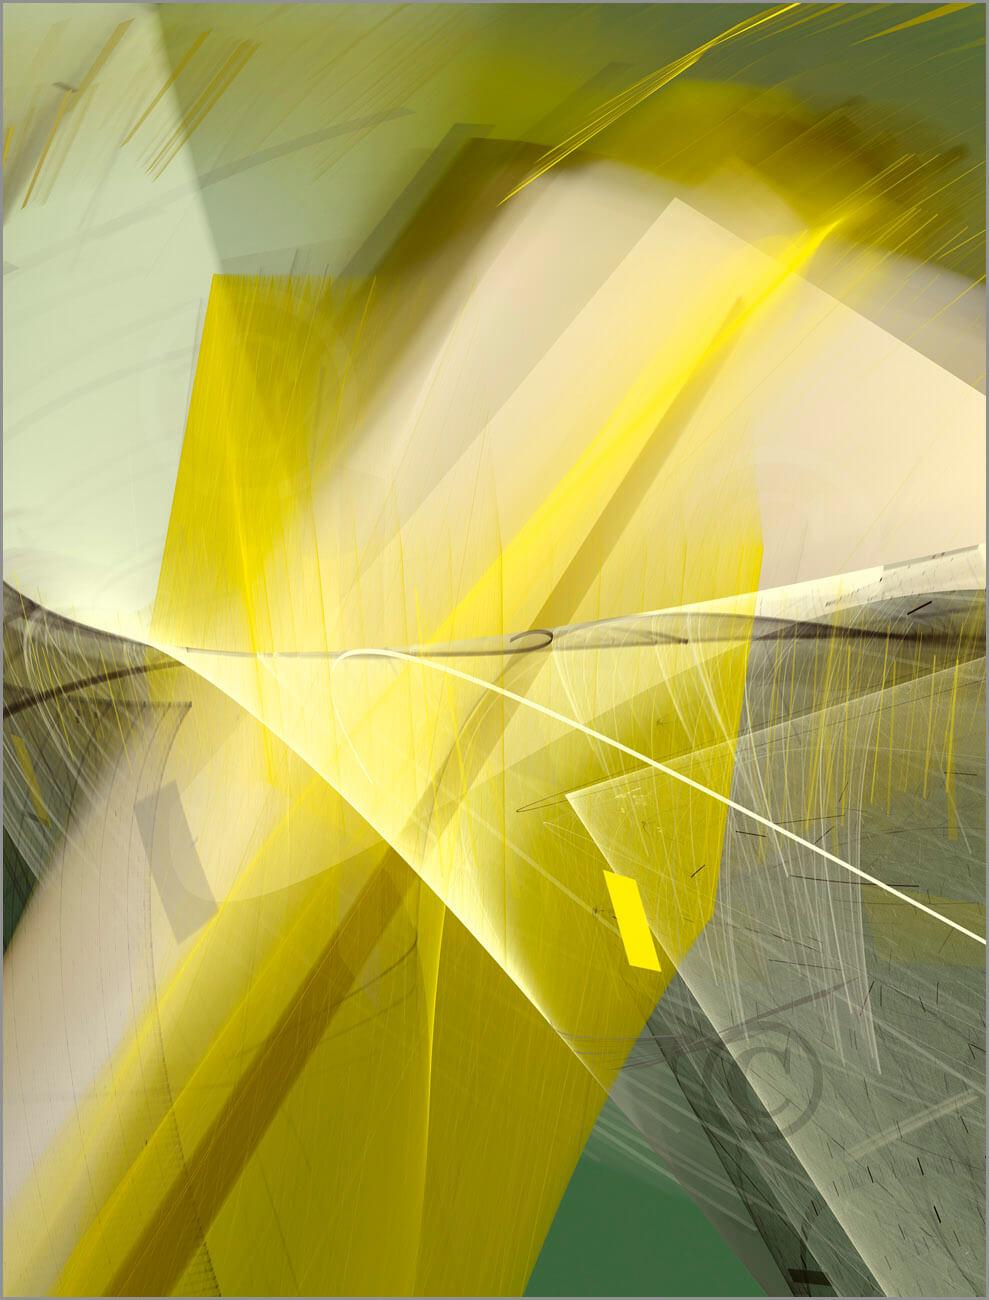 shapes_F2_17996_L